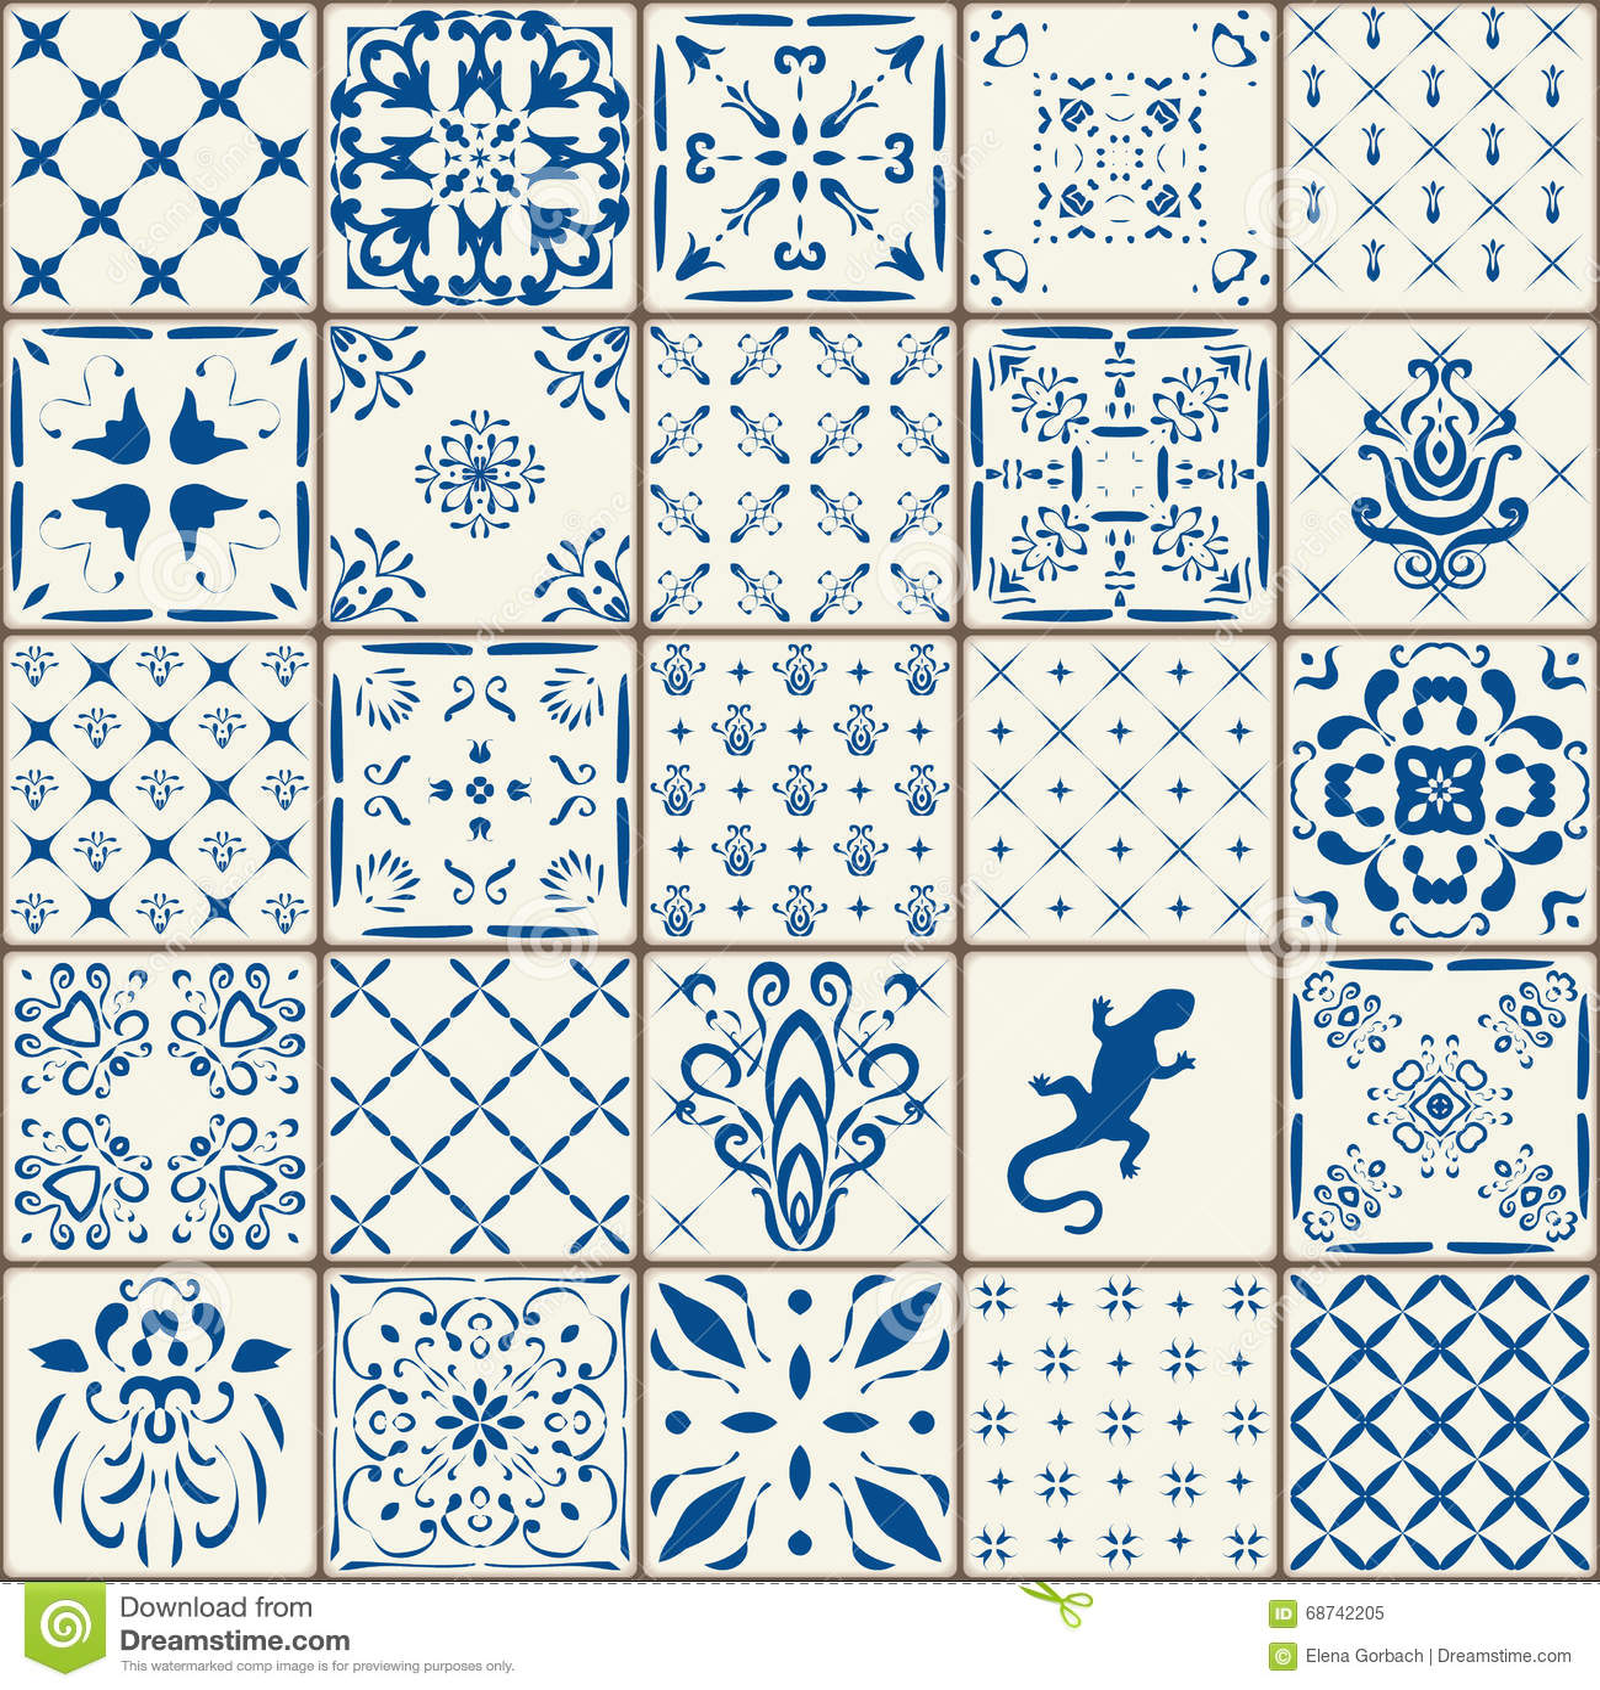 indigo blue tiles floor ornament collection gorgeous. Black Bedroom Furniture Sets. Home Design Ideas